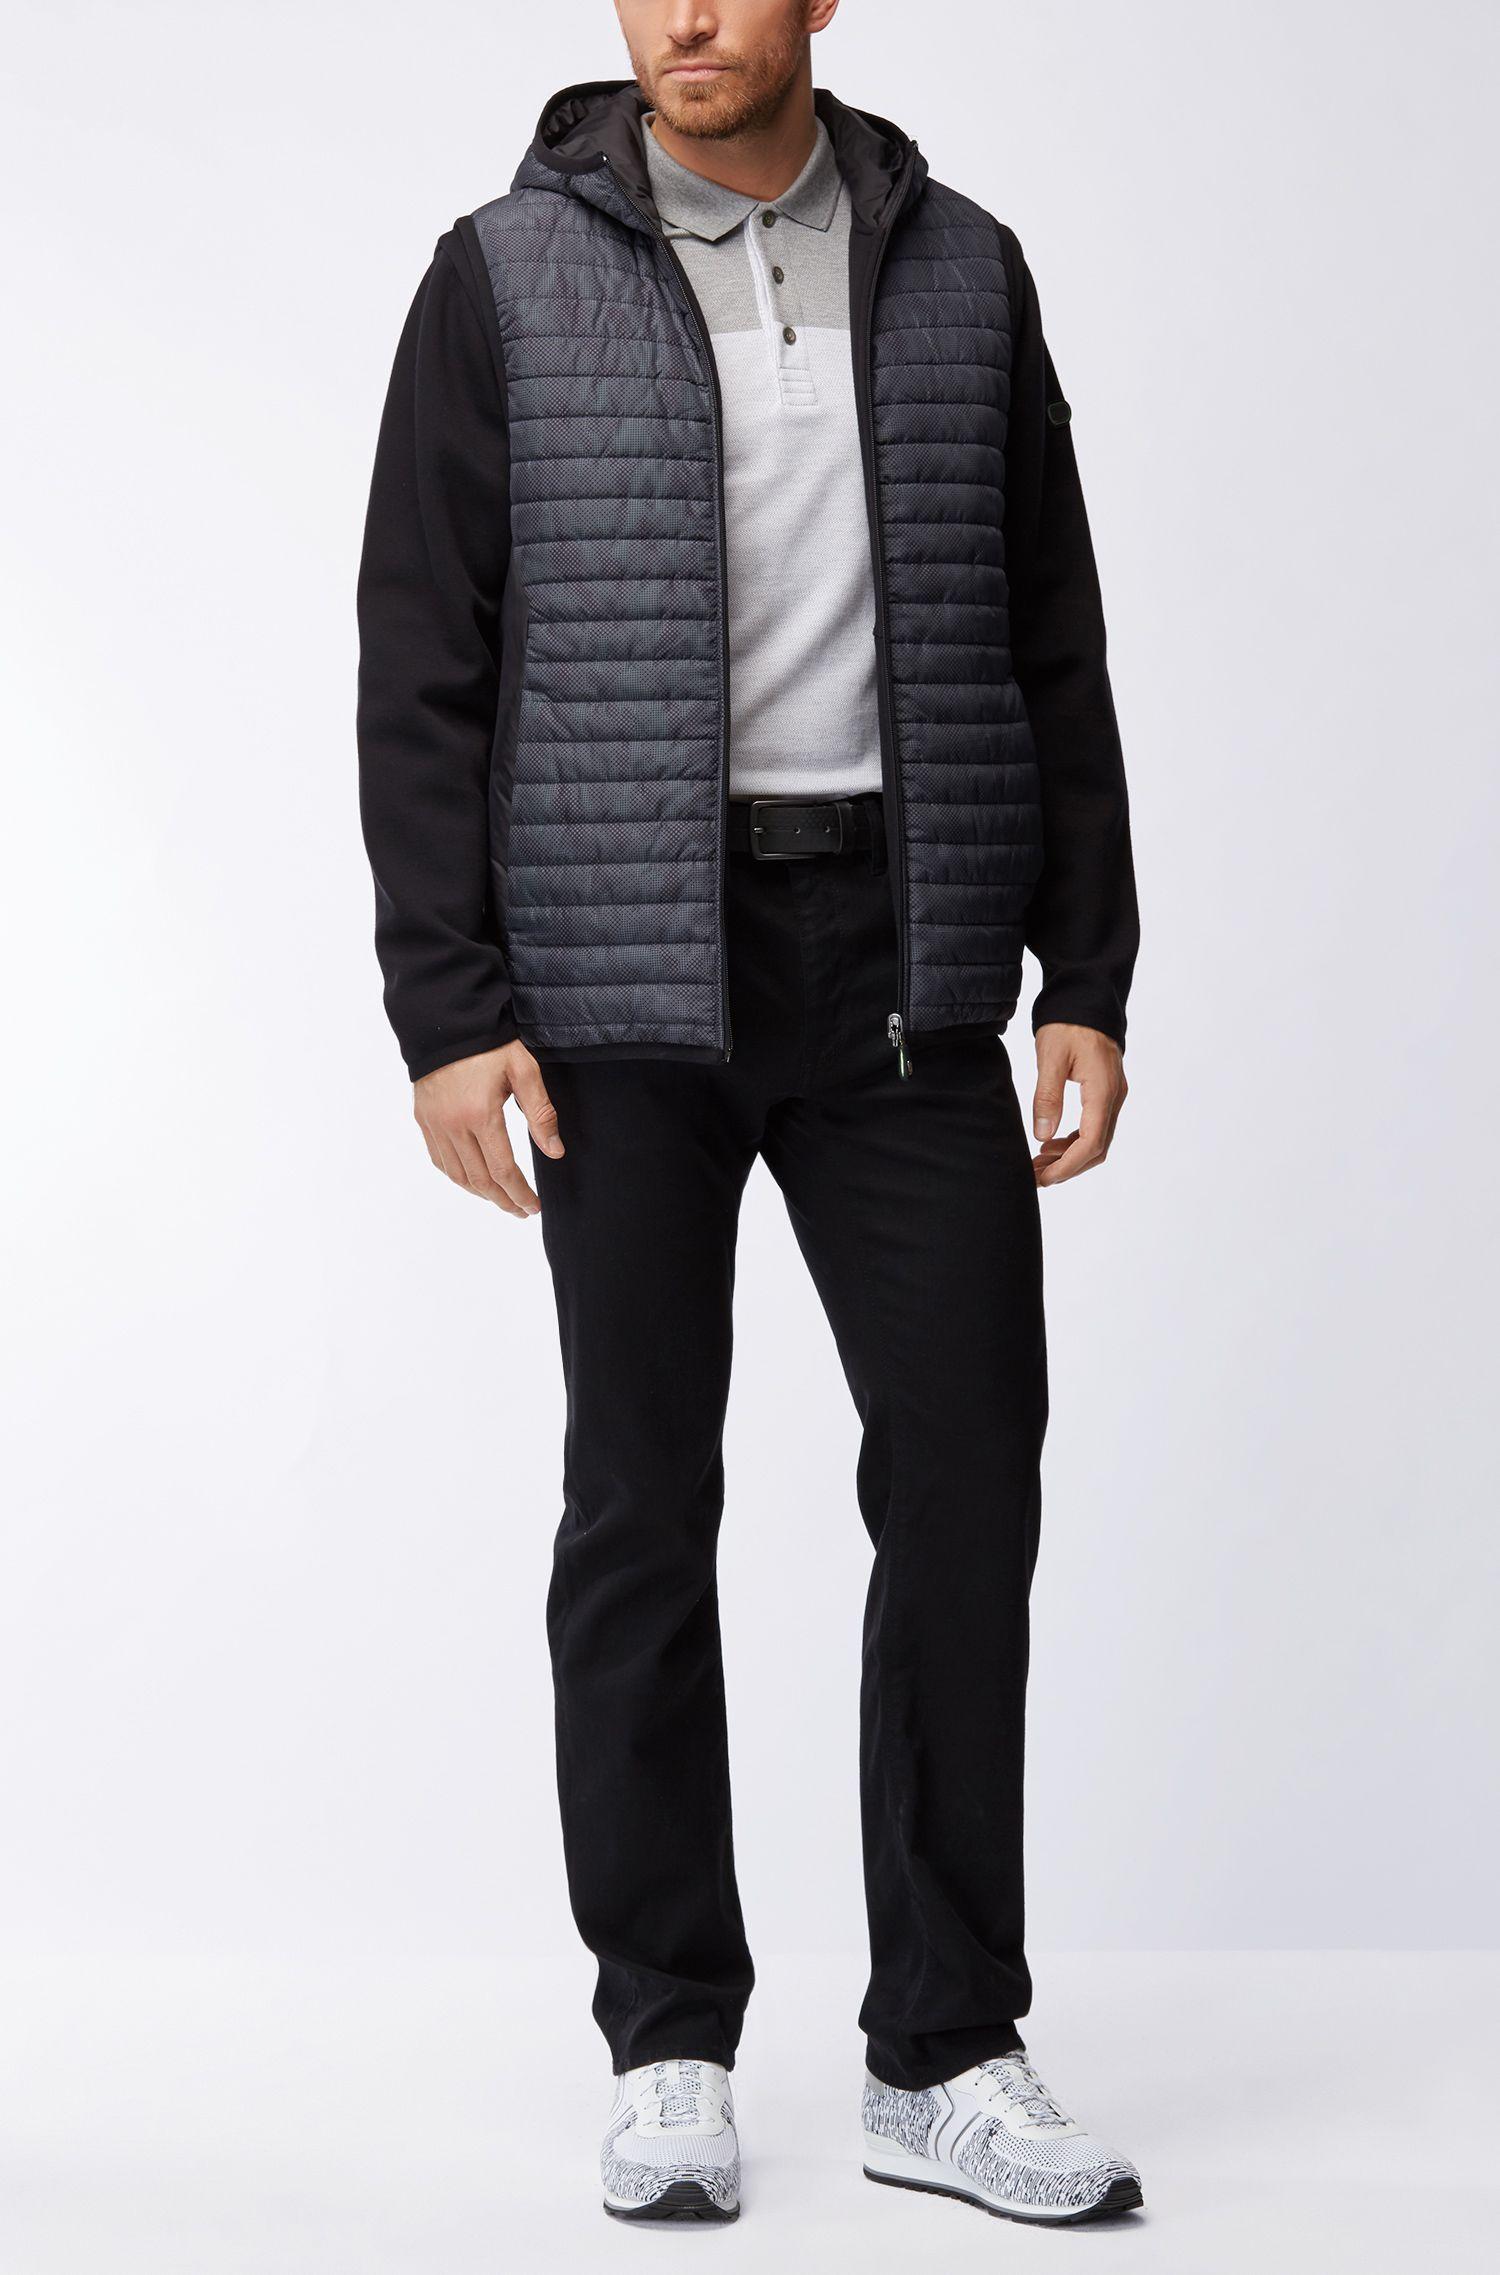 Colorblocked Cotton Polo Shirt, Slim Fit | Pleesy